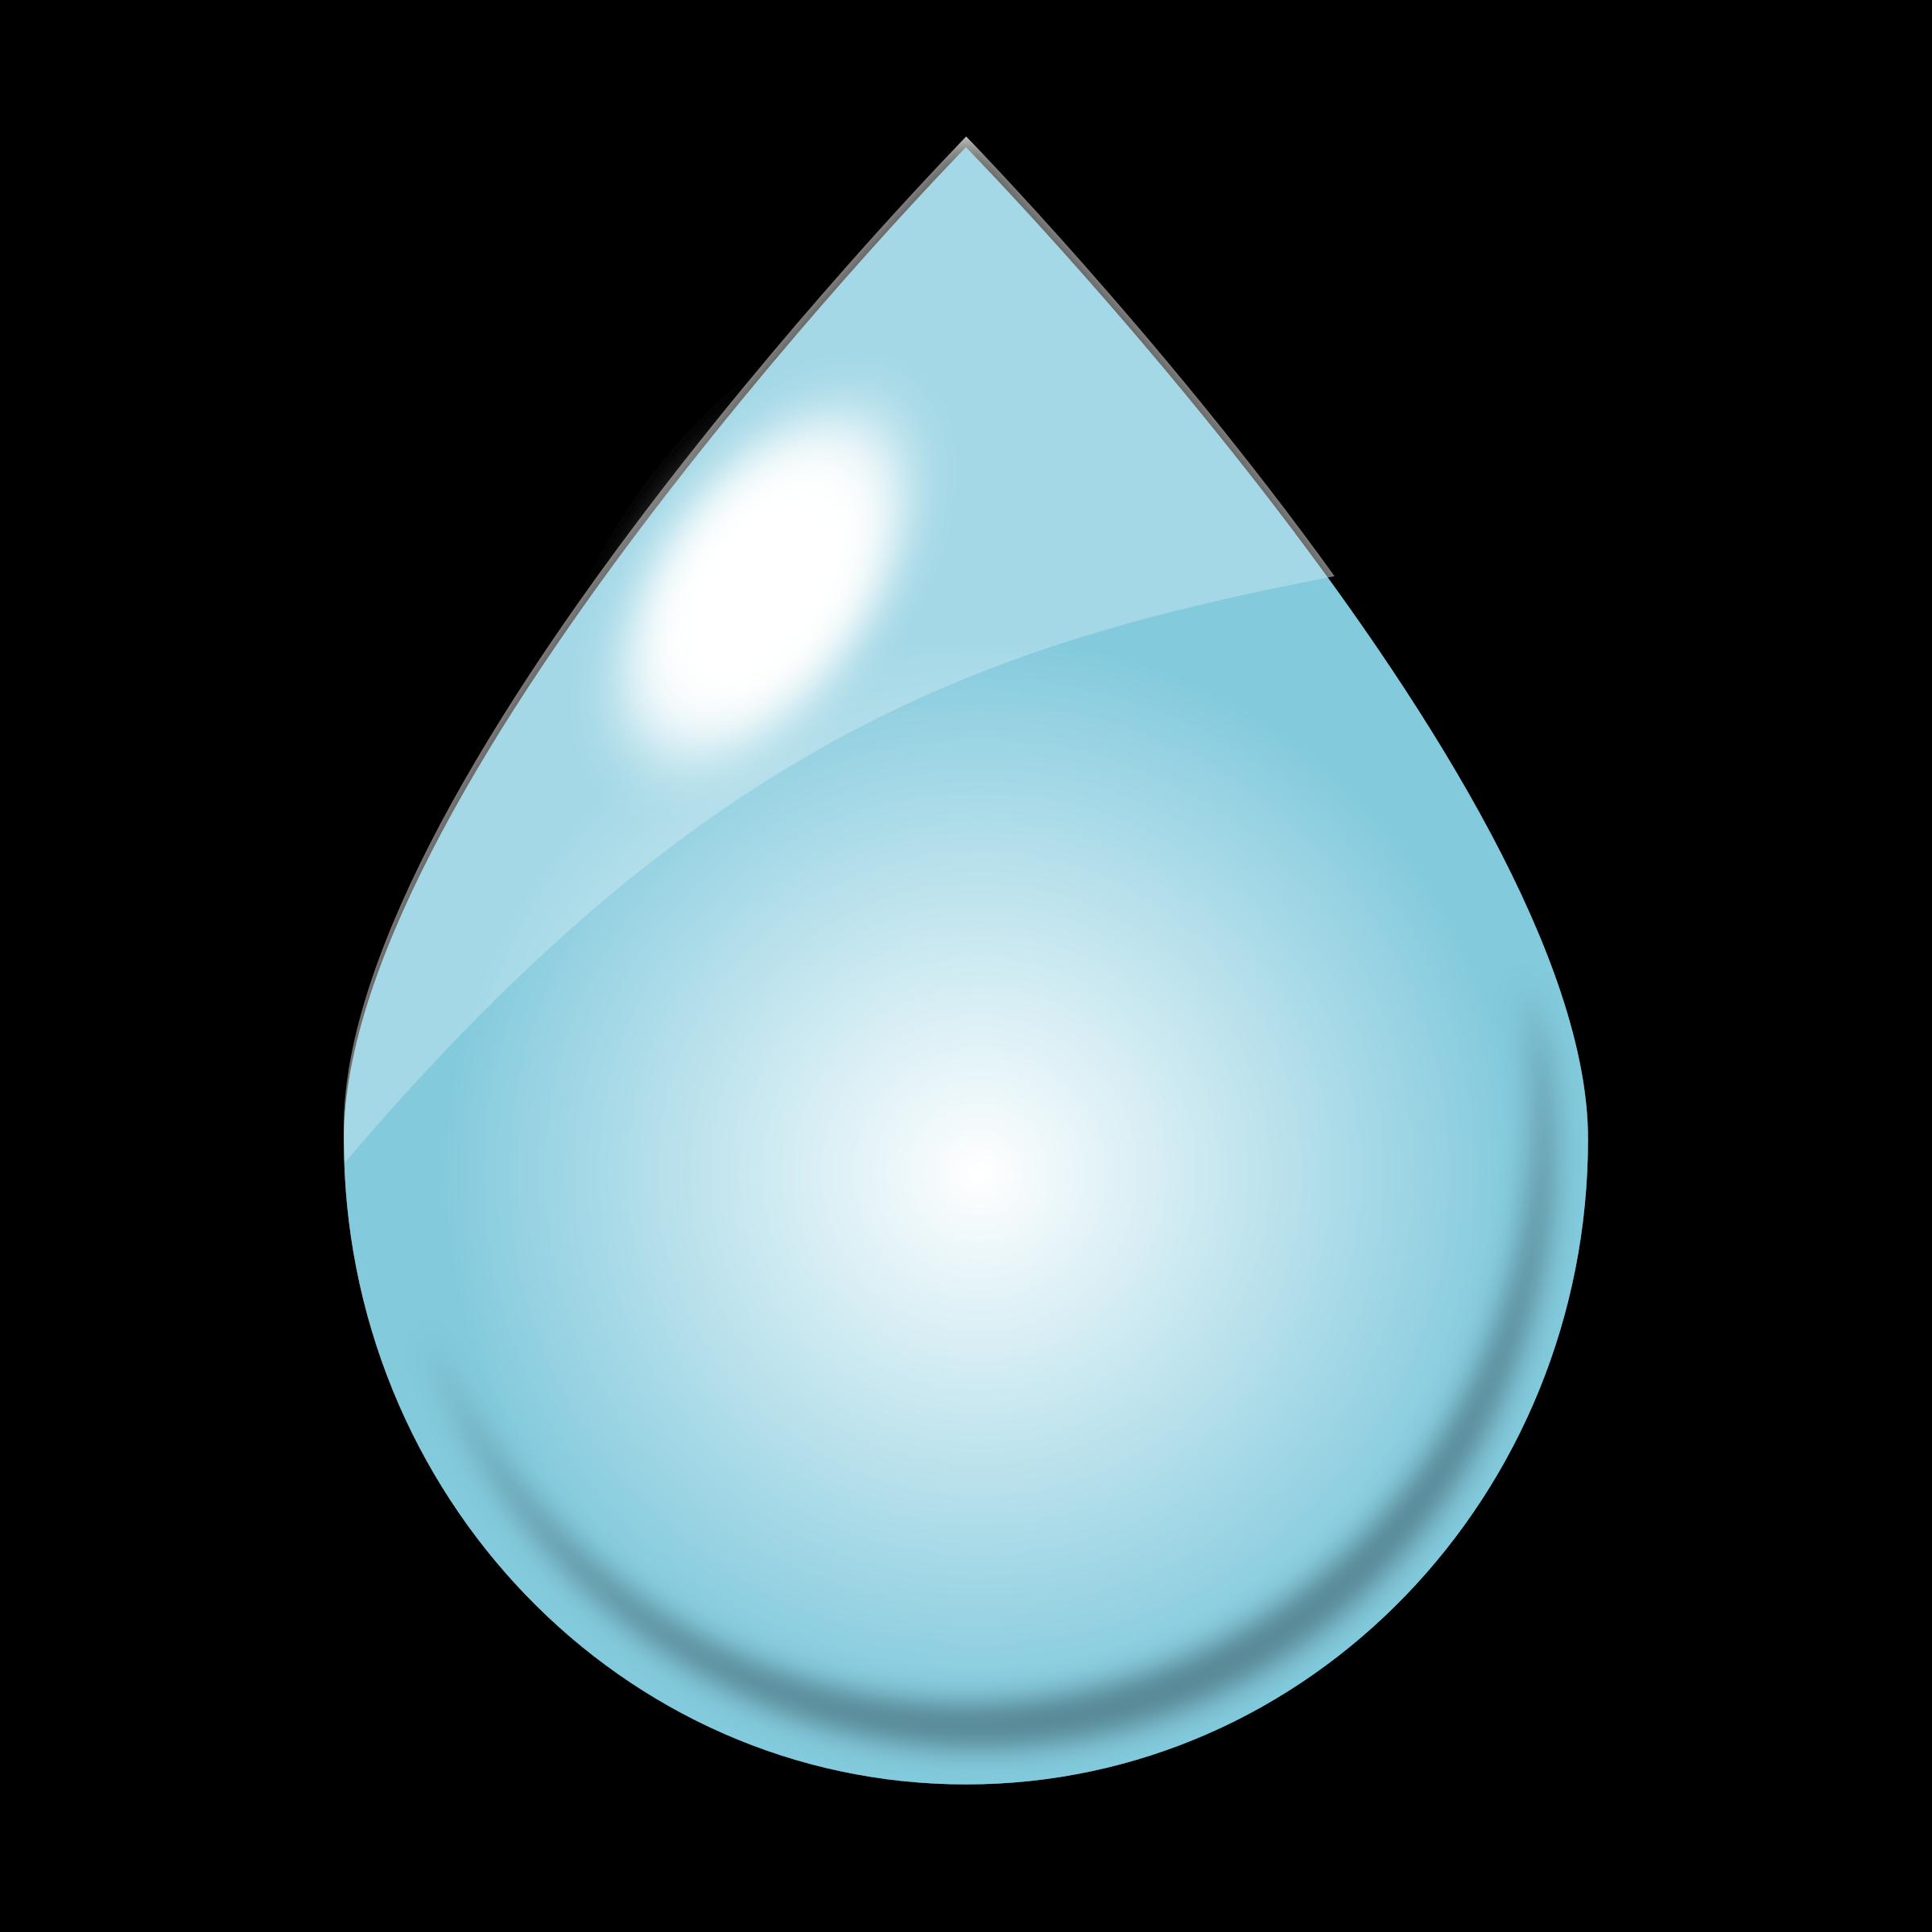 Logo ninja turtle water. Raindrop clipart coloring page